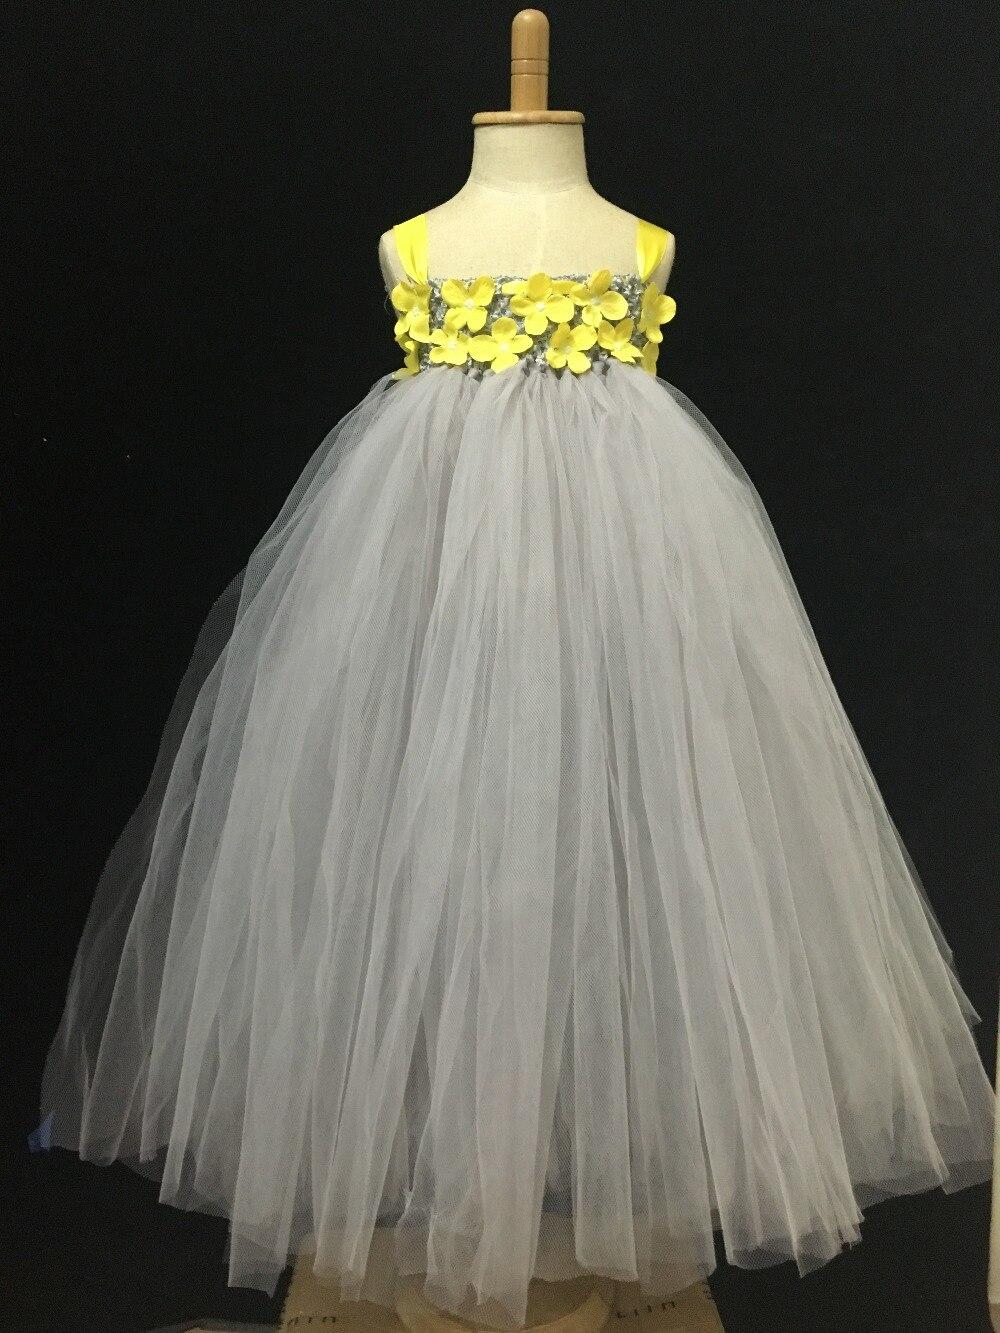 Gadis kecil Abu-abu Panjang Tutu Dress Anak Fluffy Tulle Tutus Ball - Pakaian anak anak